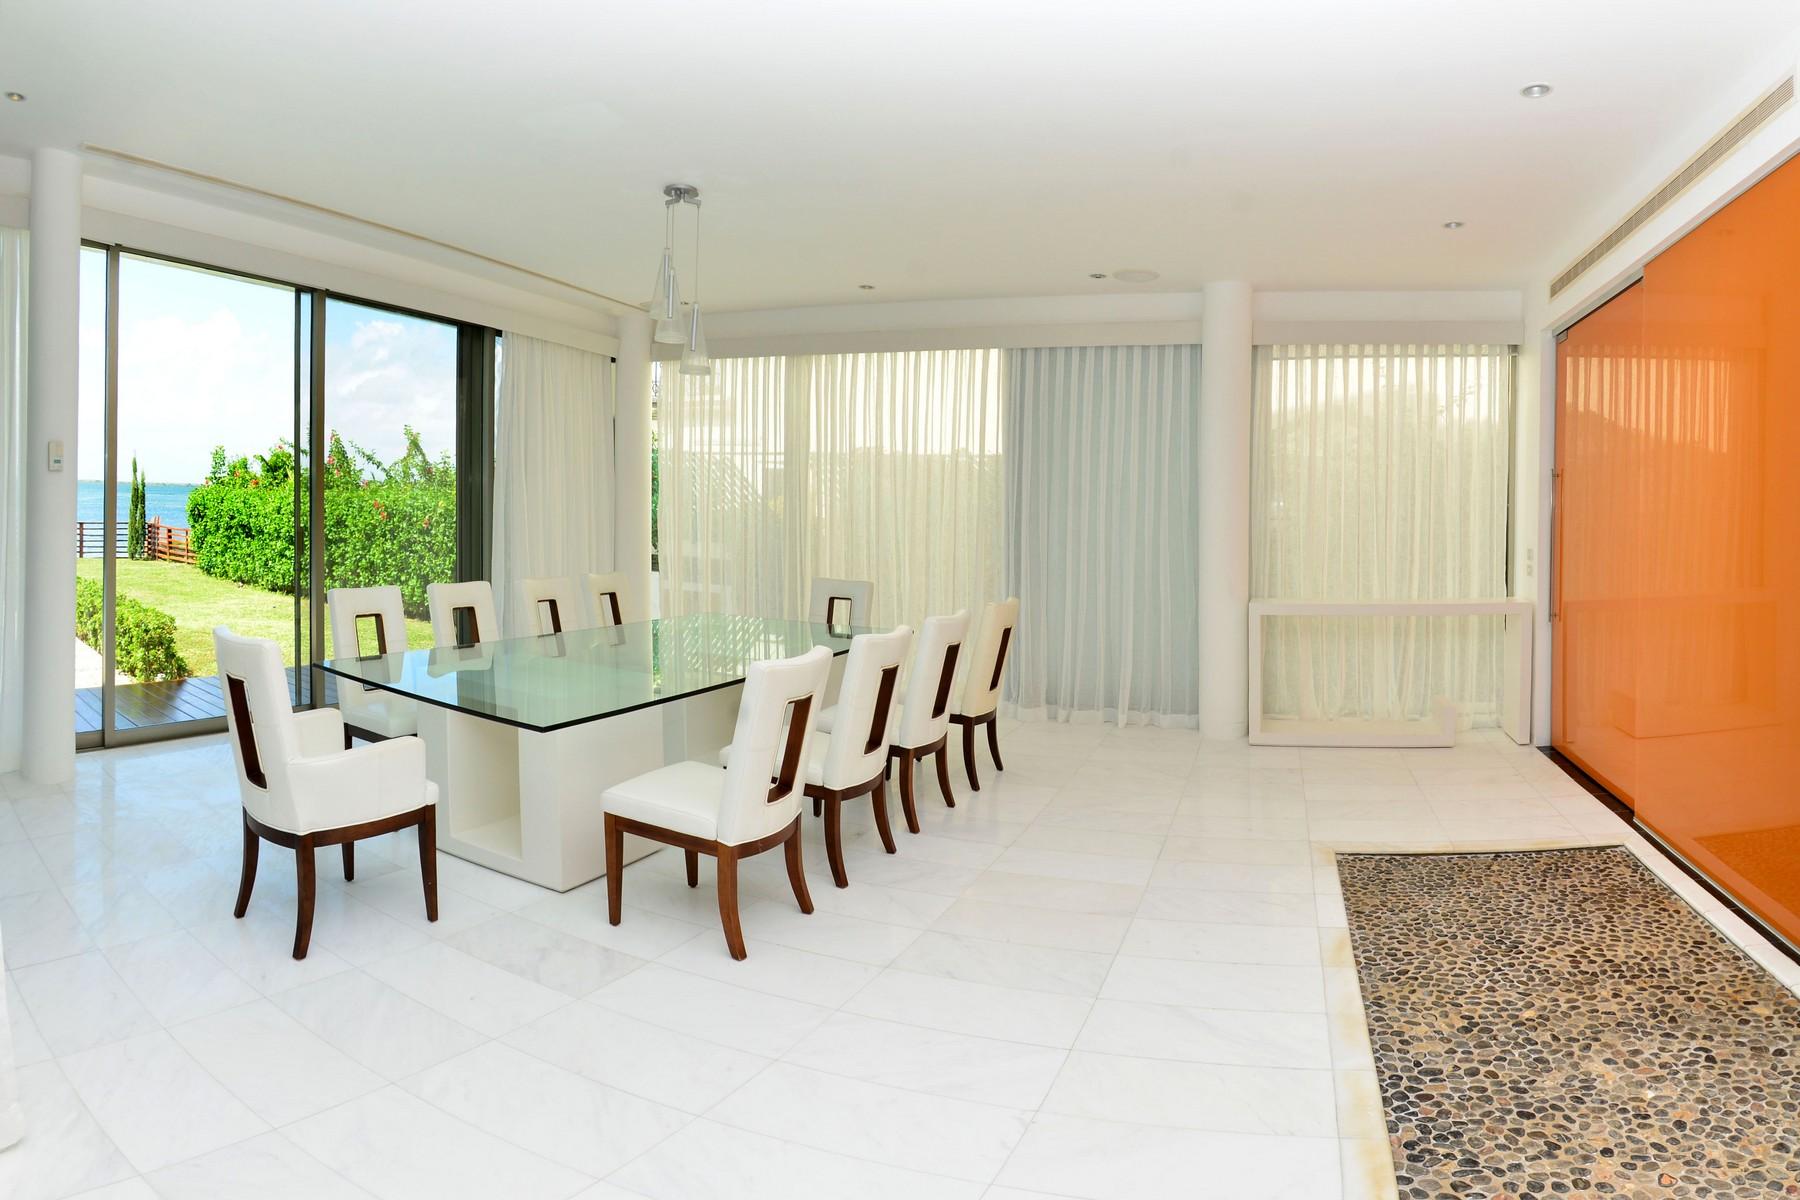 Additional photo for property listing at CASA MURMULLO WATERFRONT HOME Murmullo waterfront, Isla Dorada Cancun, Quintana Roo 77500 México